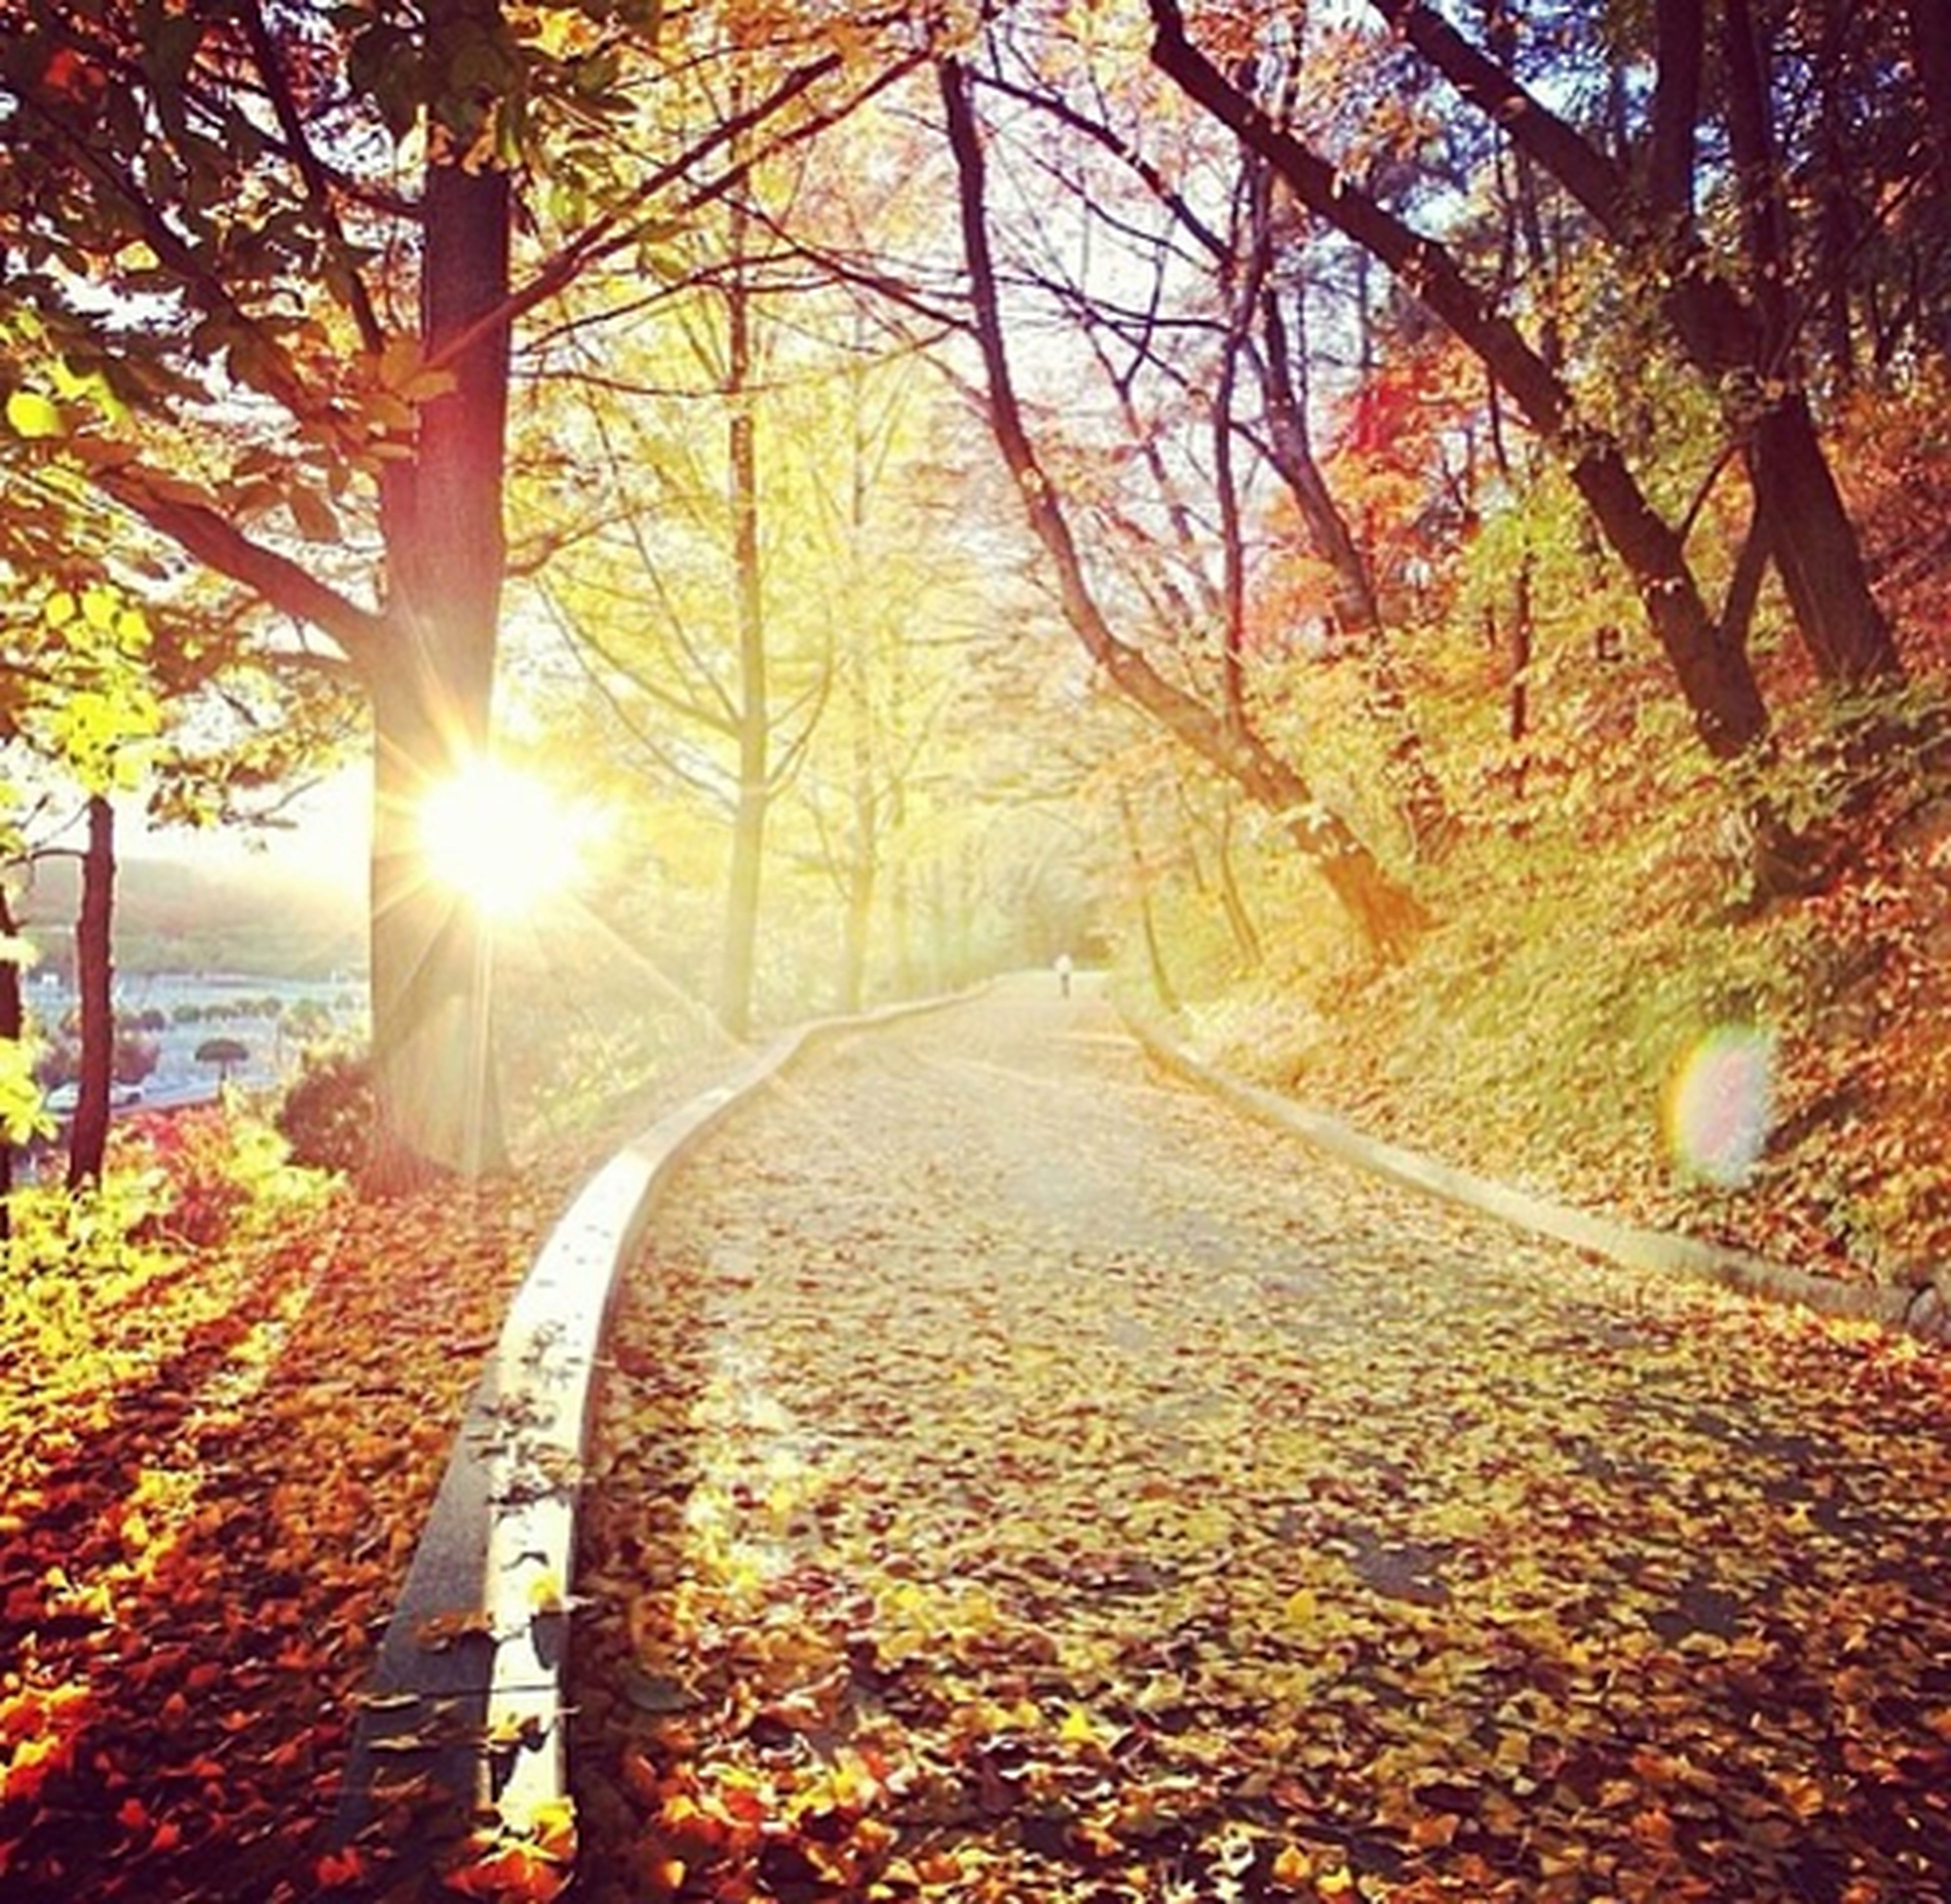 sun, tree, sunbeam, the way forward, sunlight, tranquility, lens flare, tranquil scene, sunset, nature, diminishing perspective, scenics, transportation, beauty in nature, forest, landscape, road, vanishing point, non-urban scene, autumn